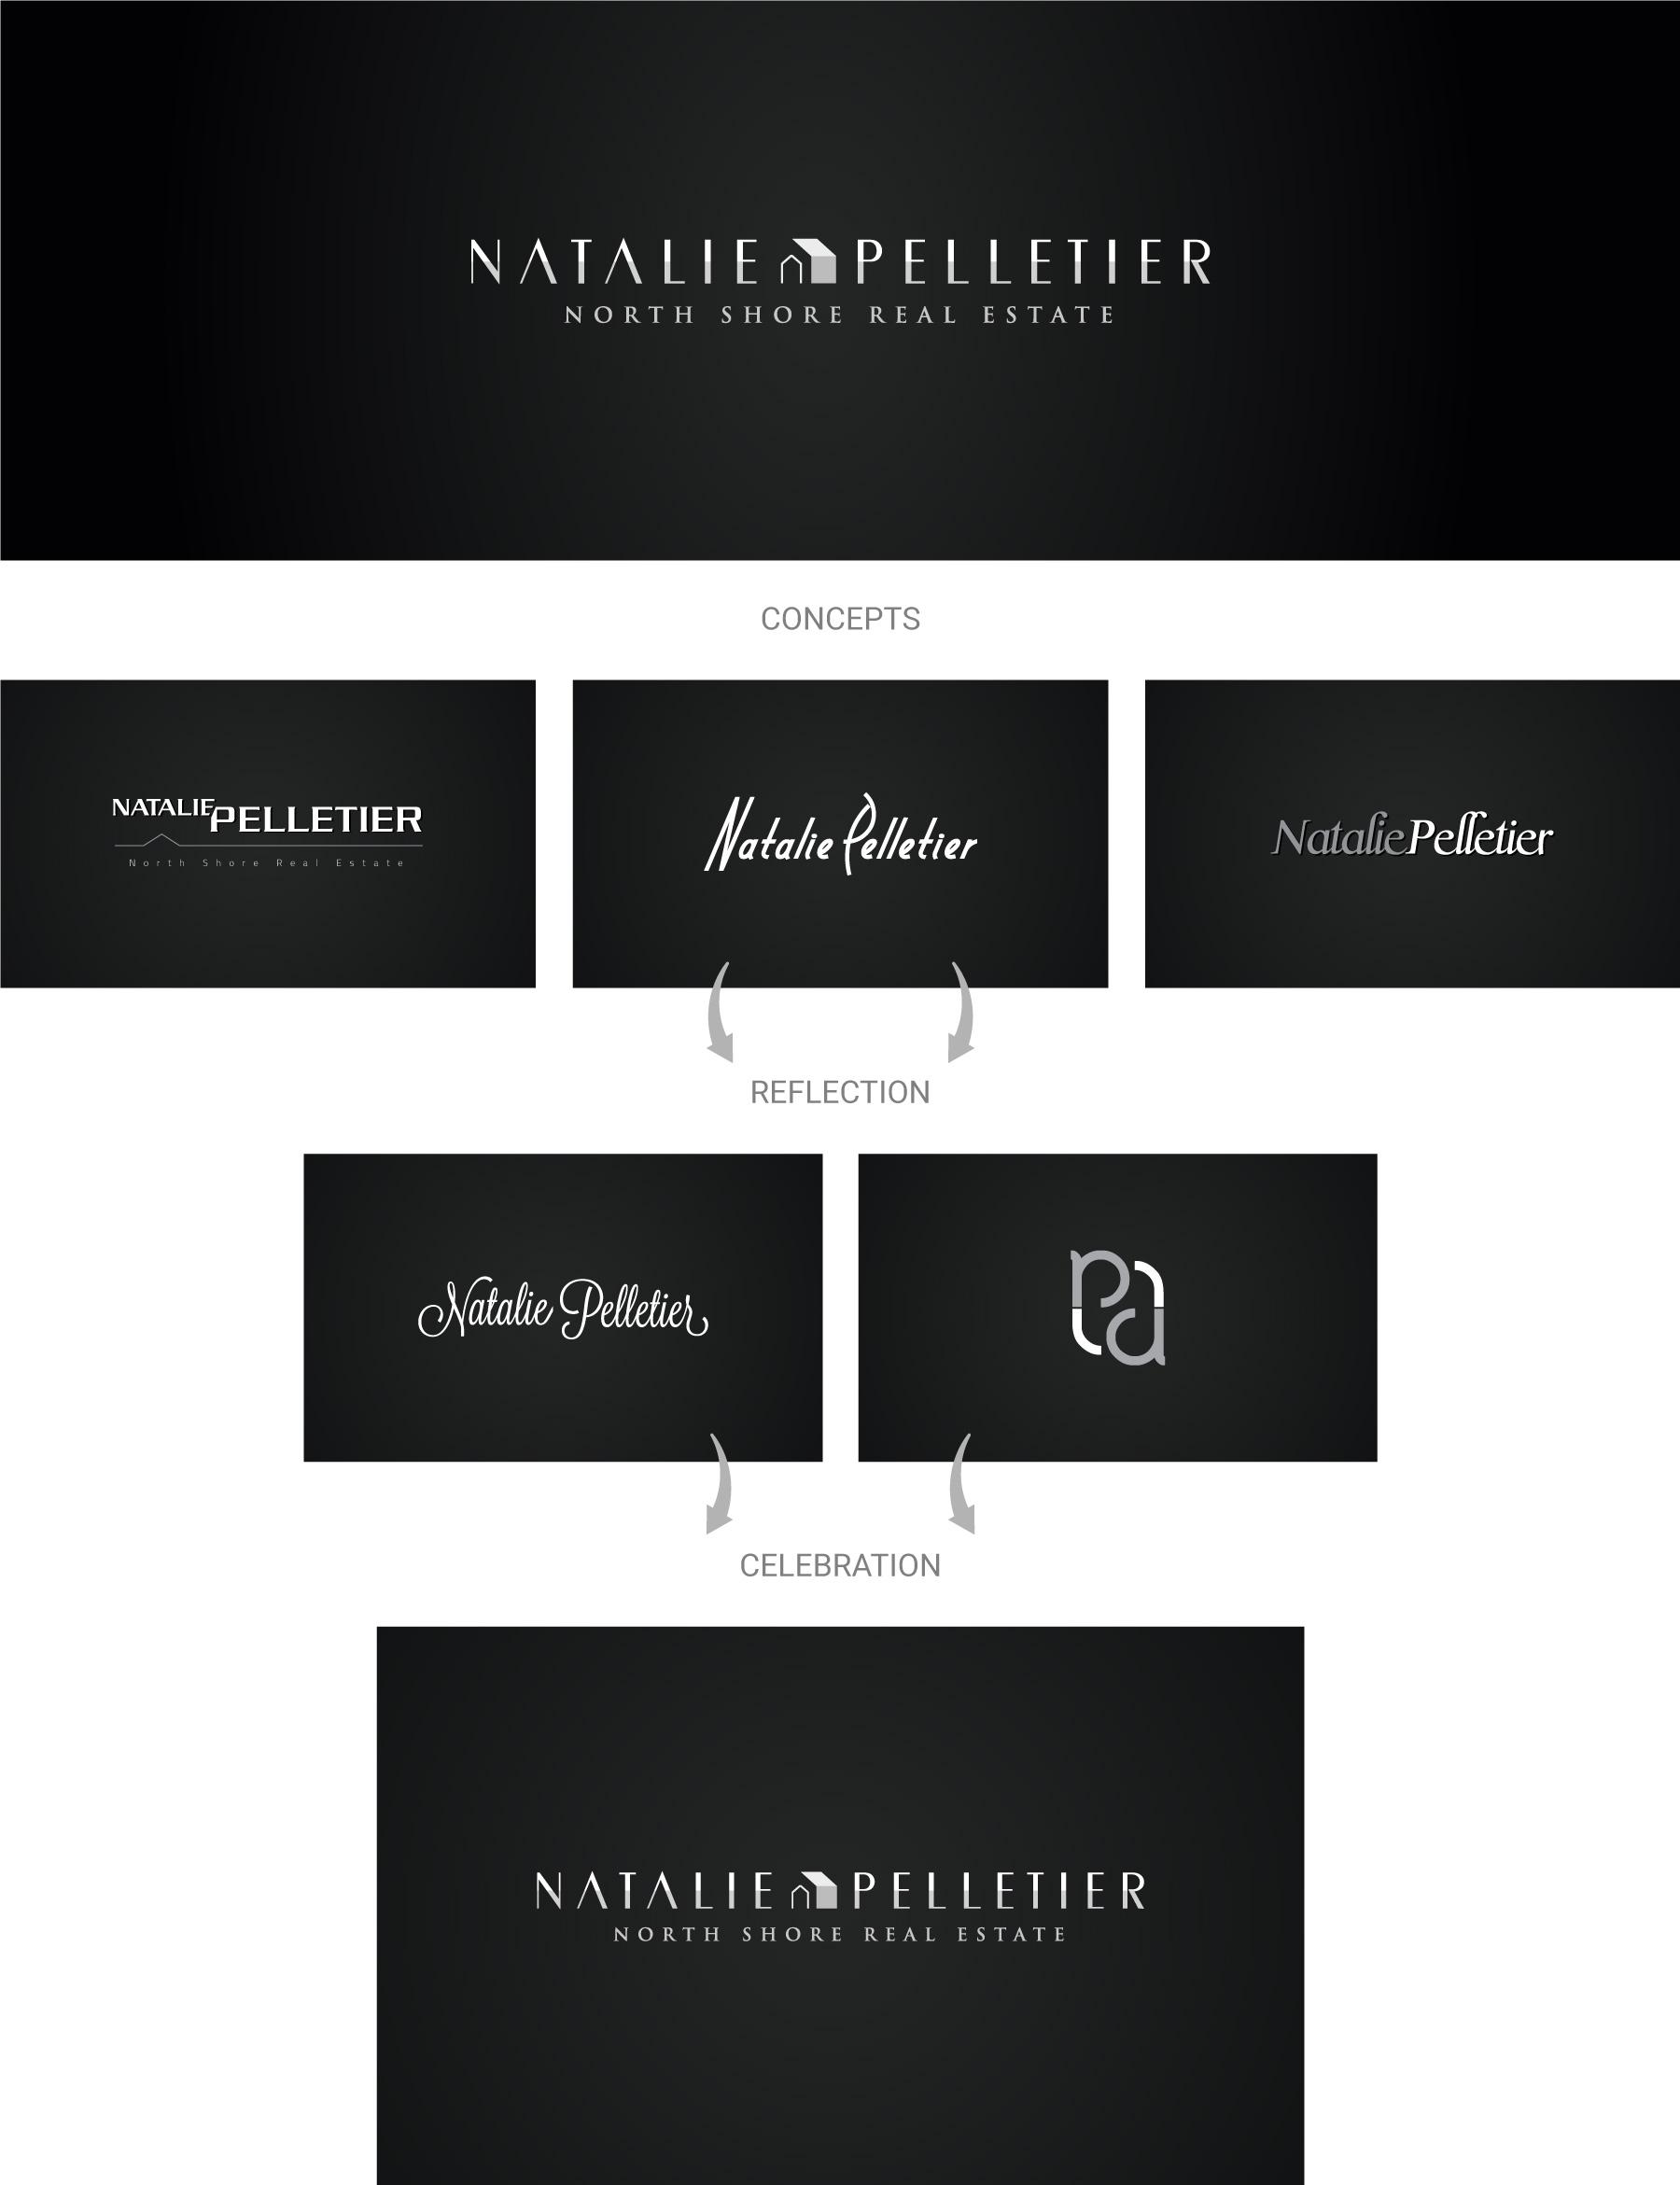 Natalie-pelletier-logo-design